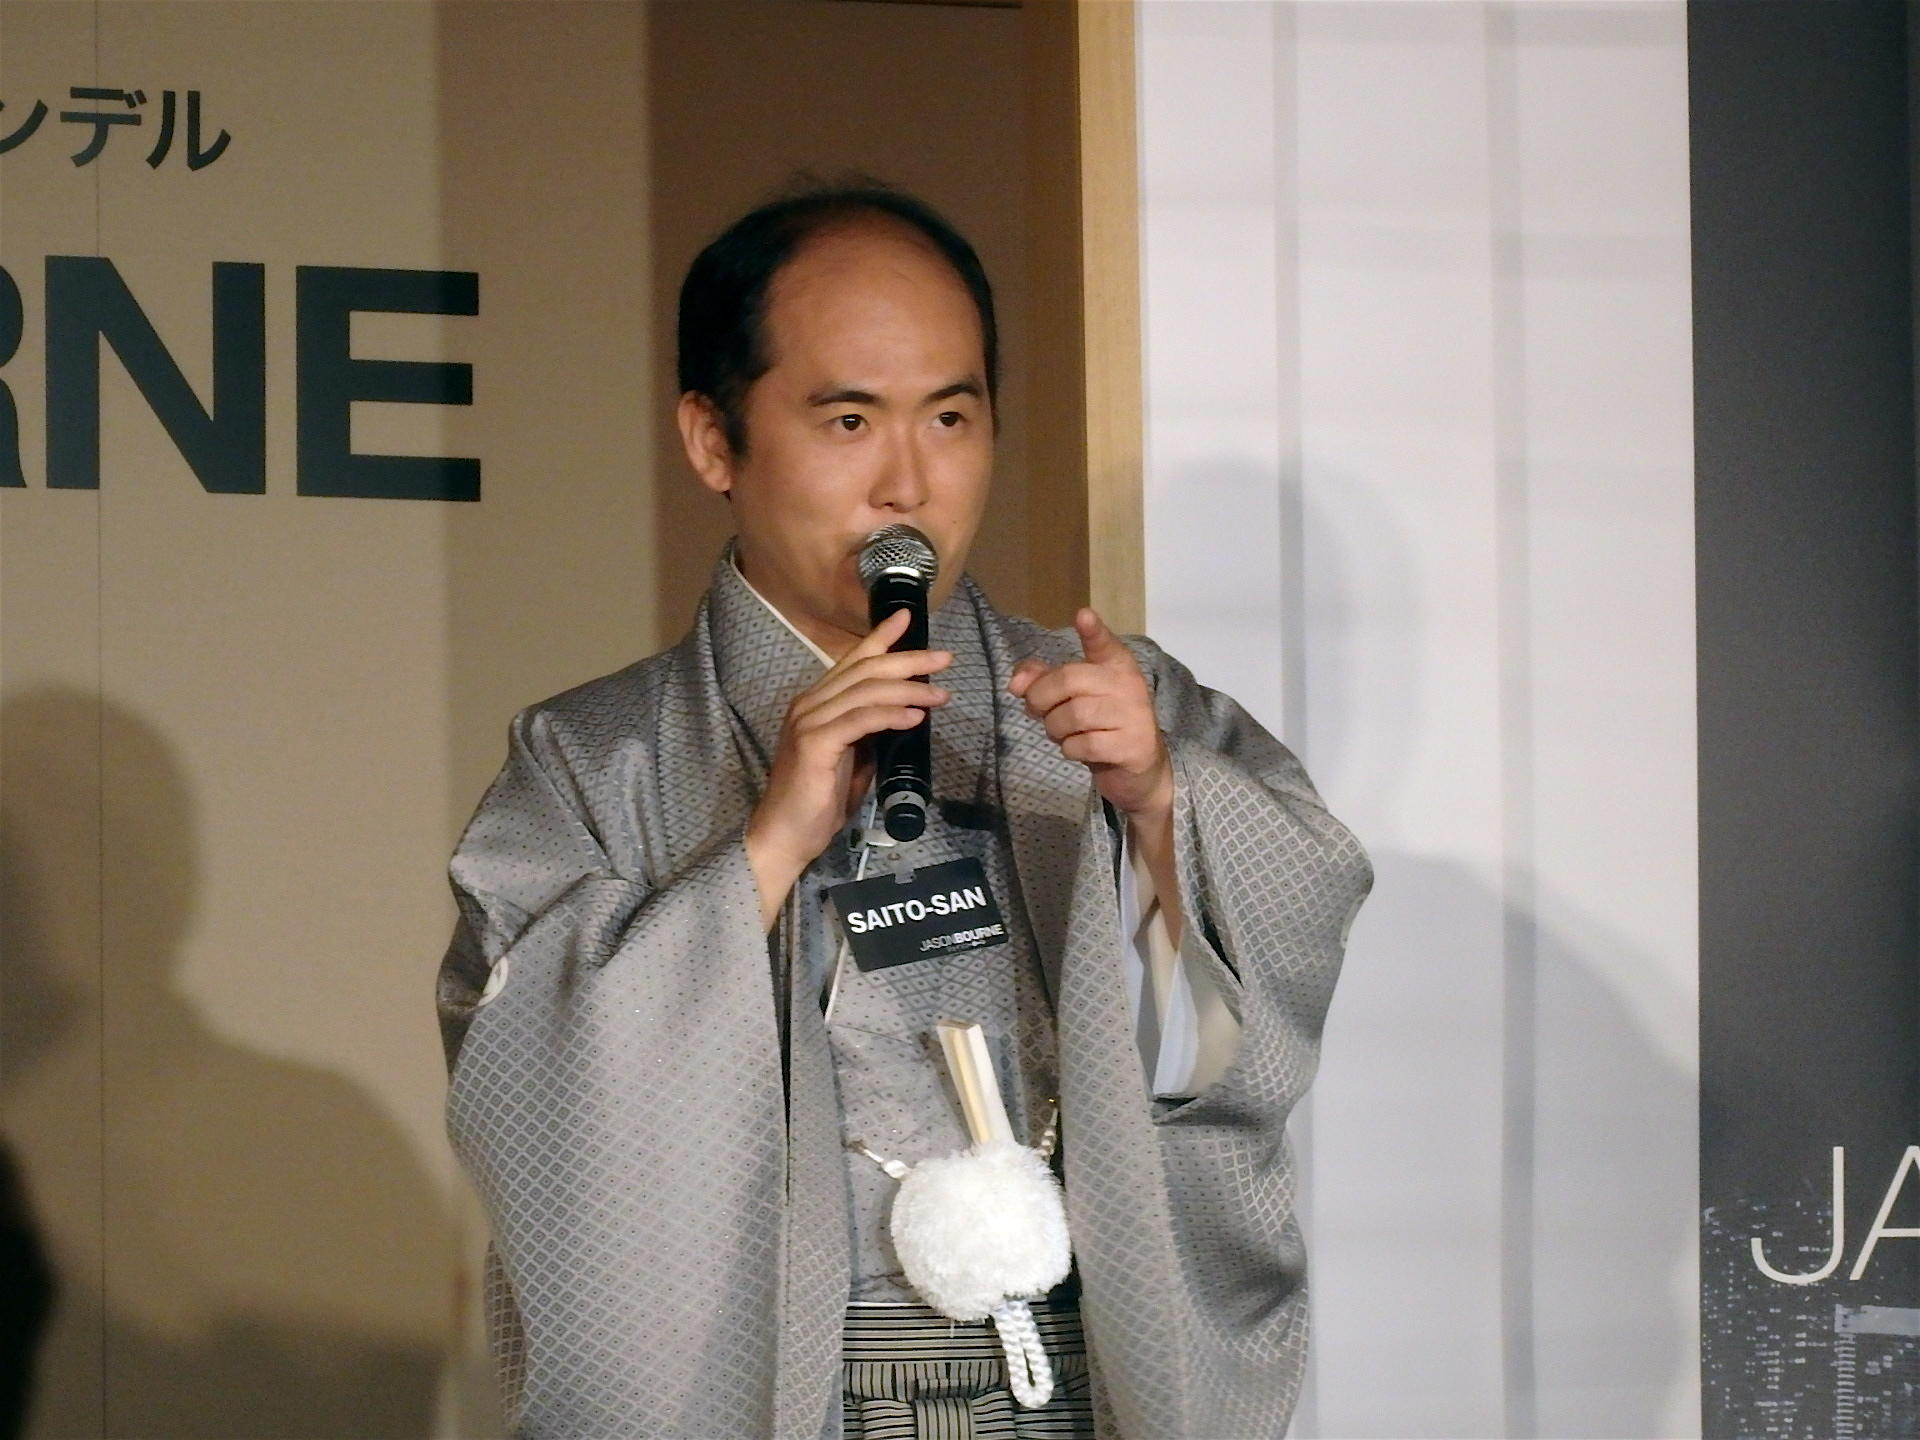 http://news.yoshimoto.co.jp/20160929230017-3f07c66a94382b7757b67dd541034aef97a2735e.jpg